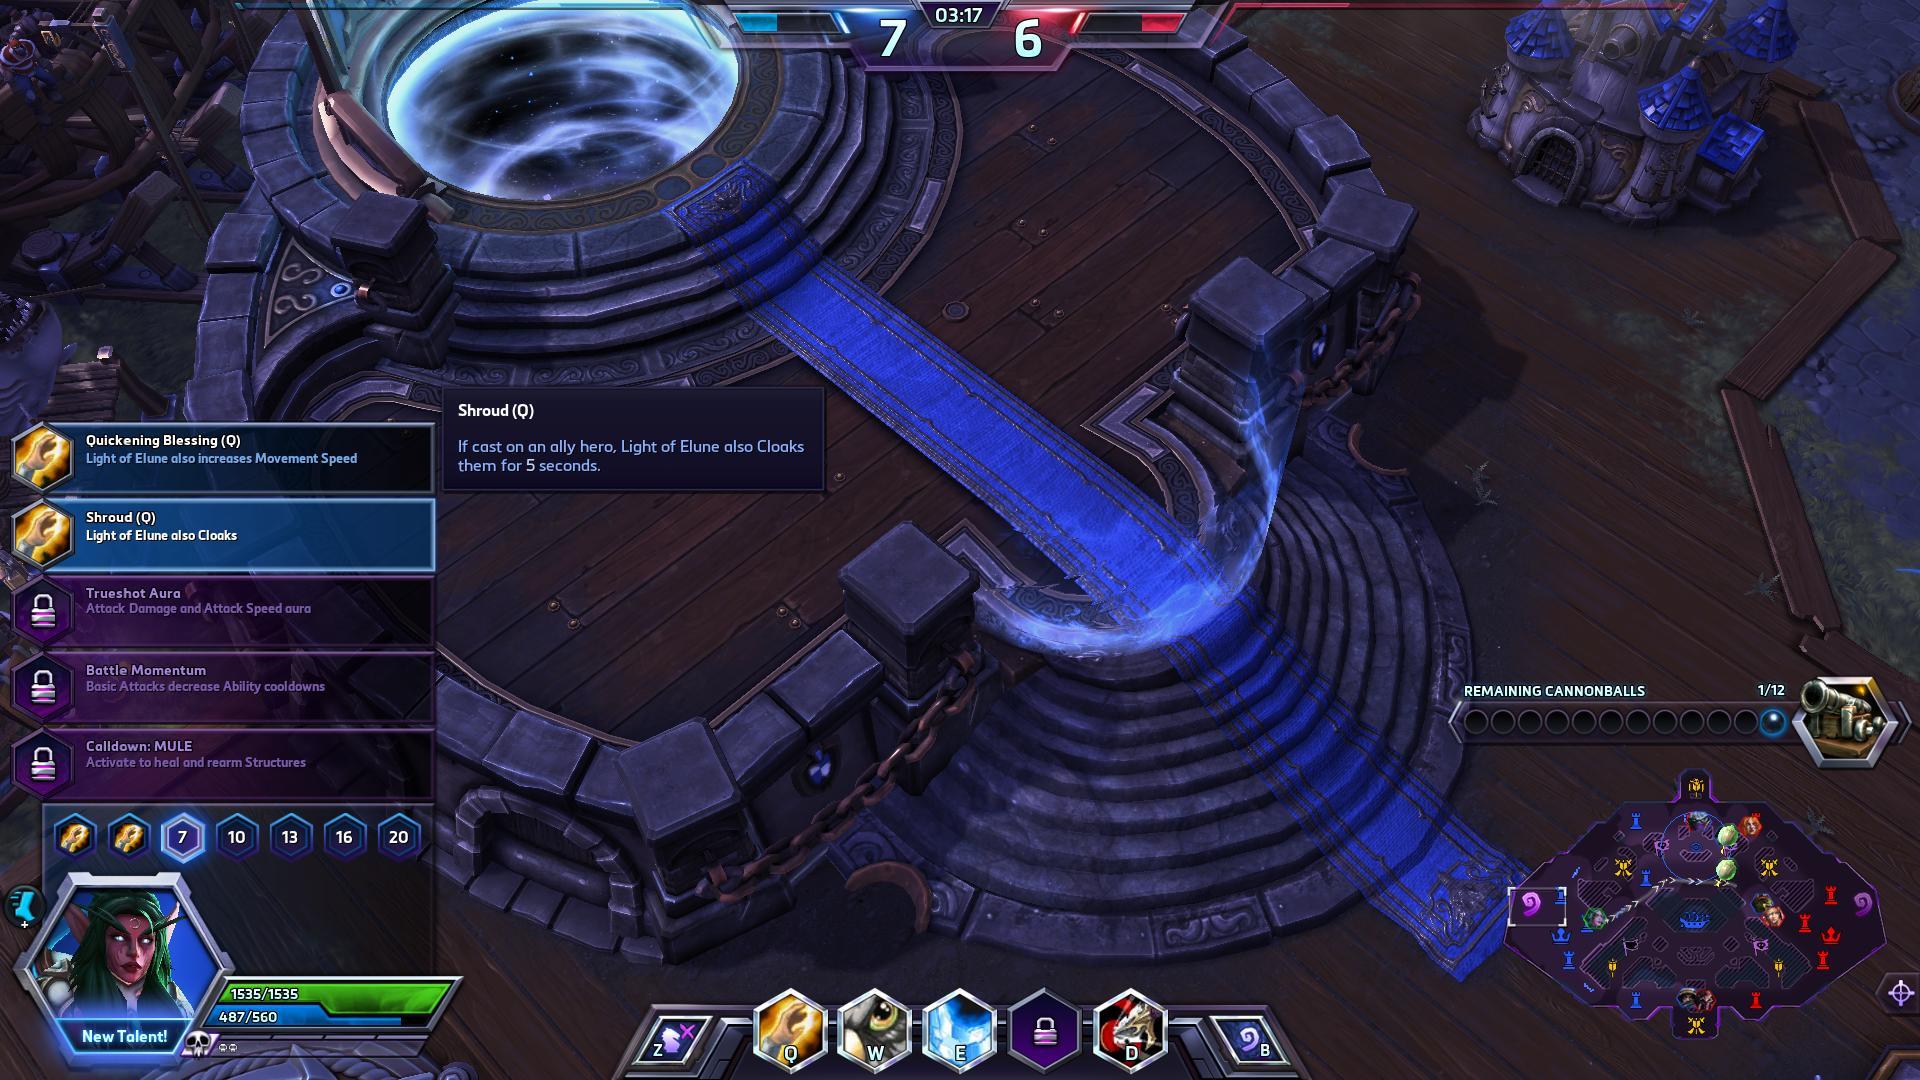 Shroud Tyrande hots screenshot - Gamingcfg com